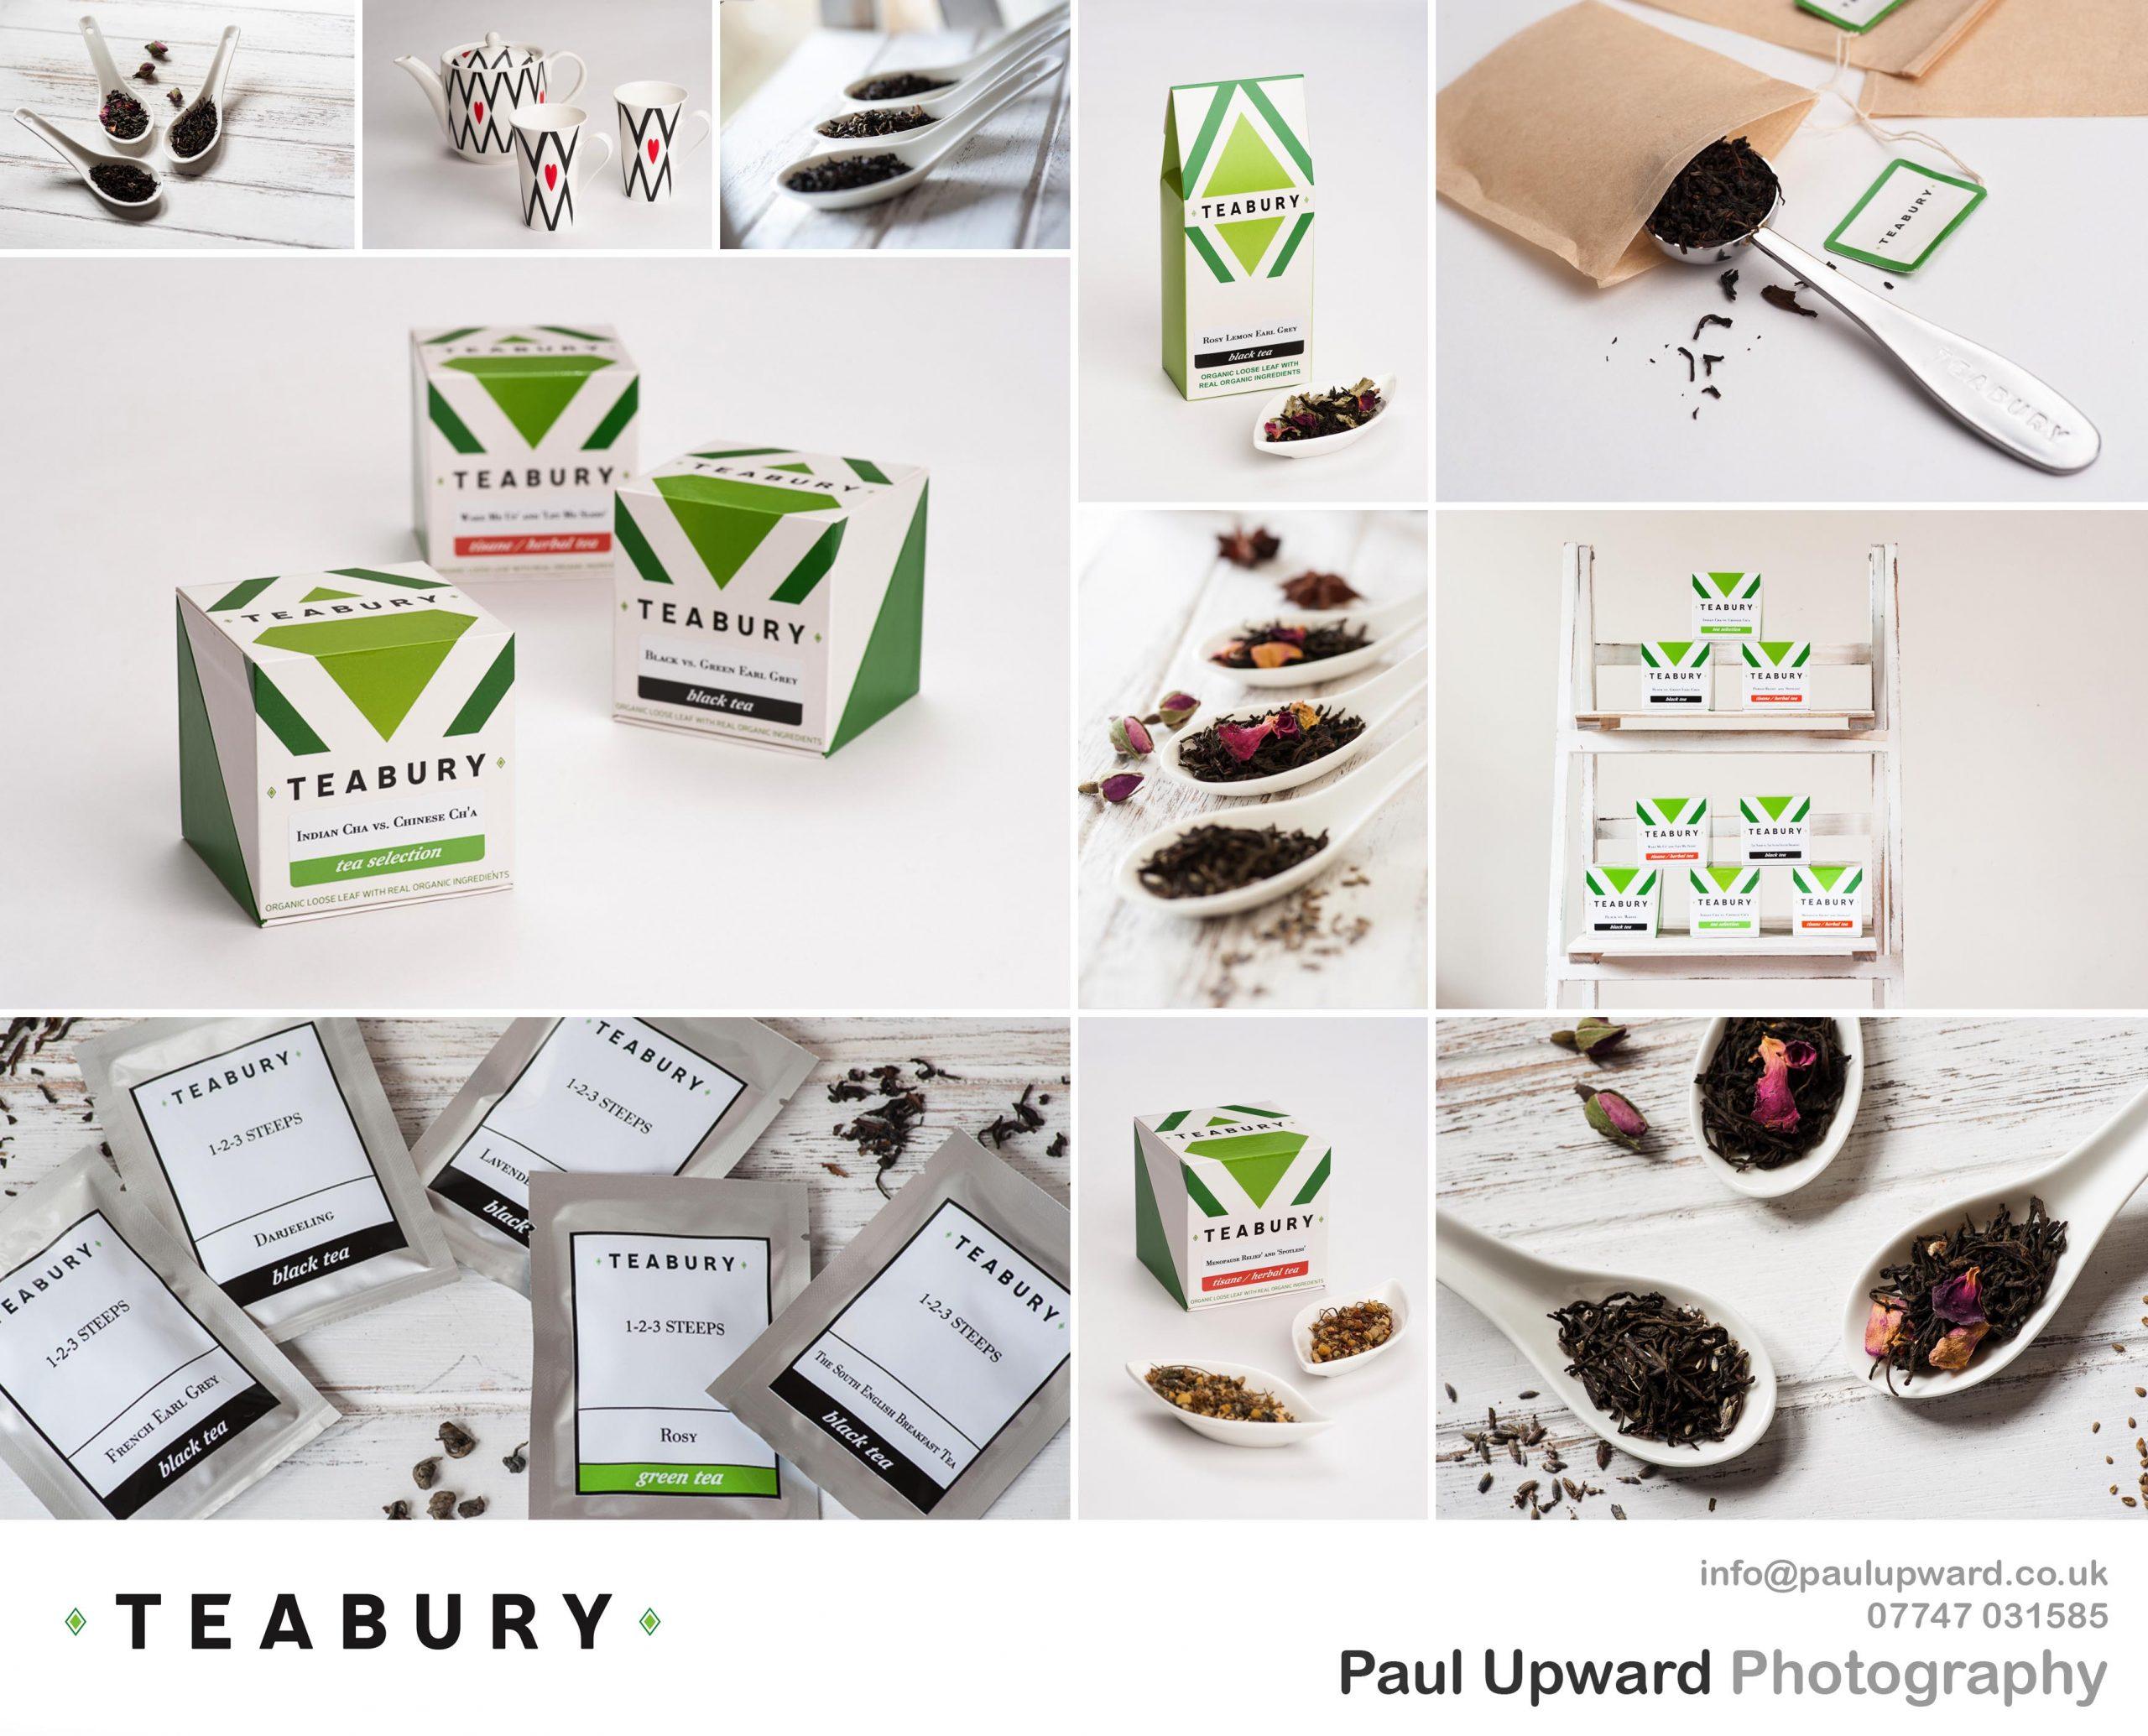 Teabury Teas and Accessories